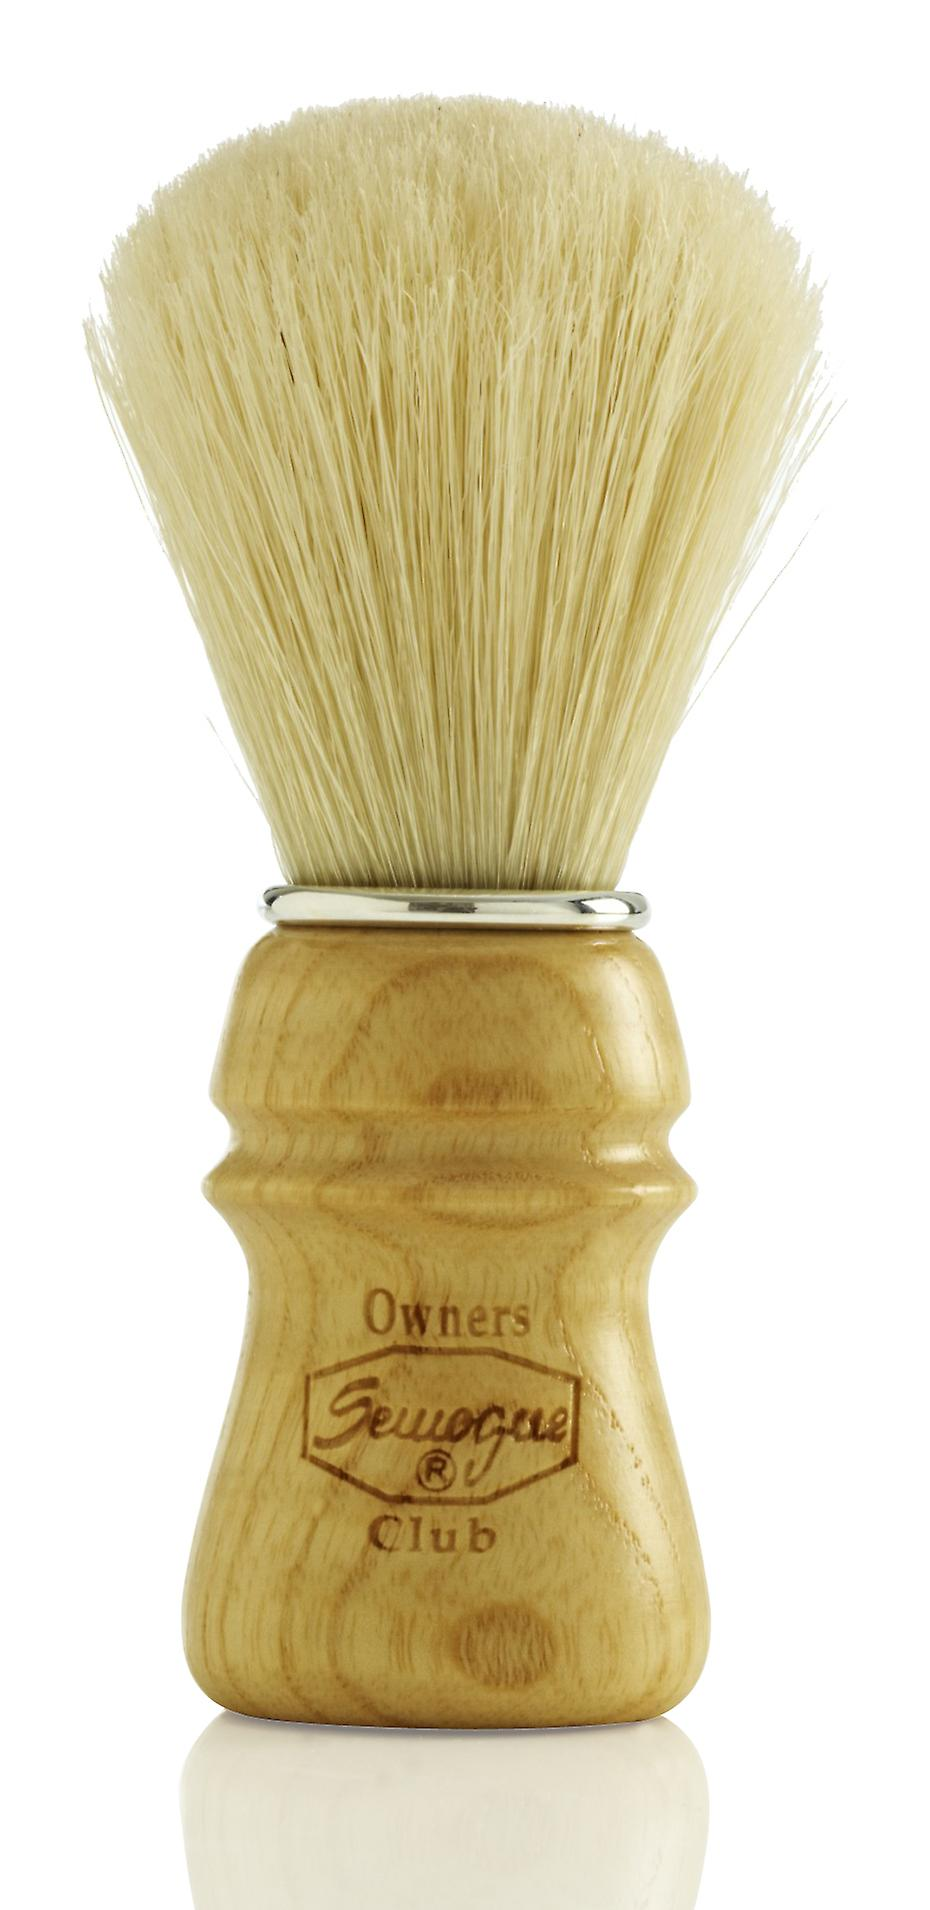 Semogue Owners Club (SOC) Pure Bristle Shaving Brush - Ash